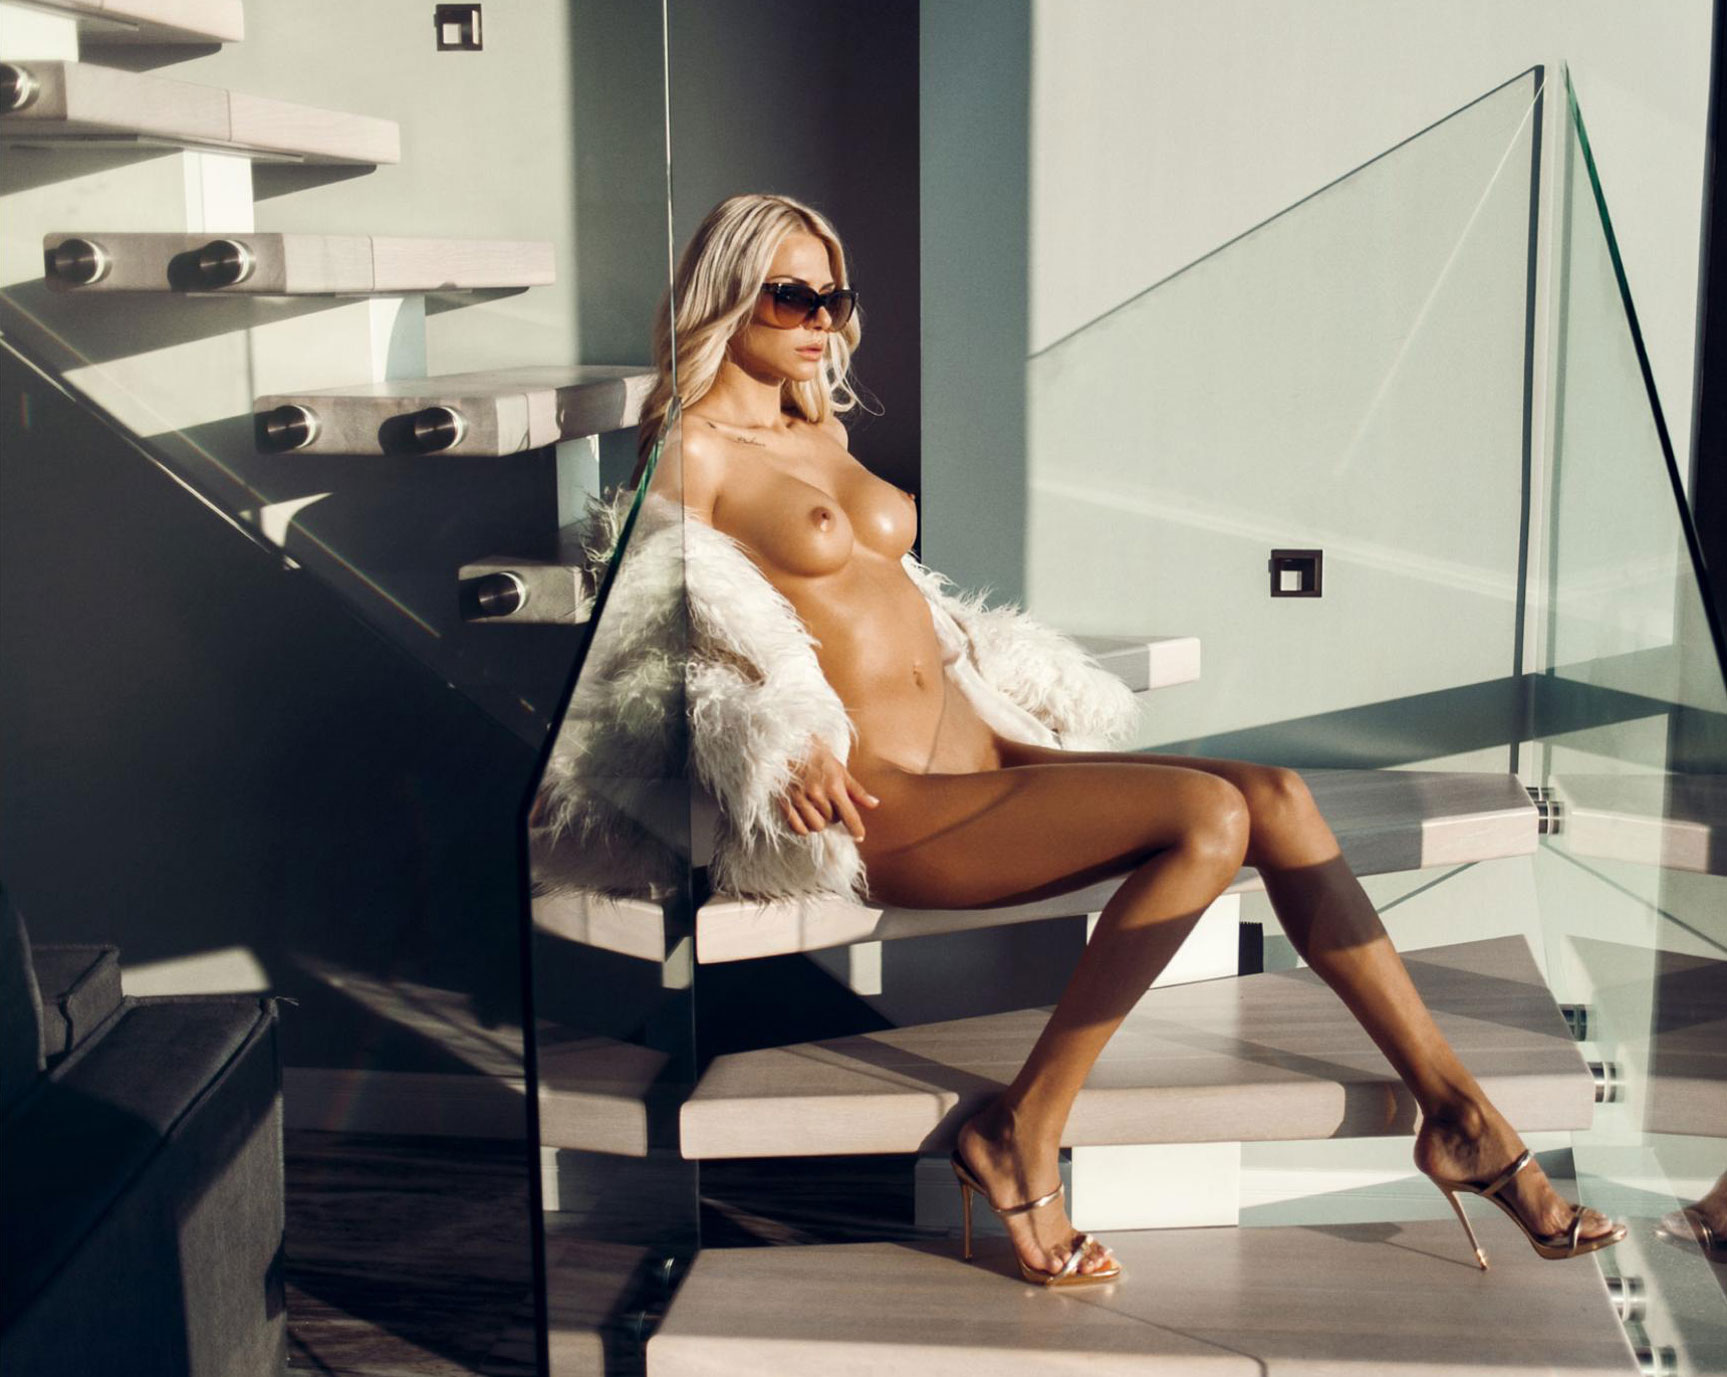 The Beauty is White / Liza Svistunova by Evgeniy Potanin / Volo Magazine february 2018